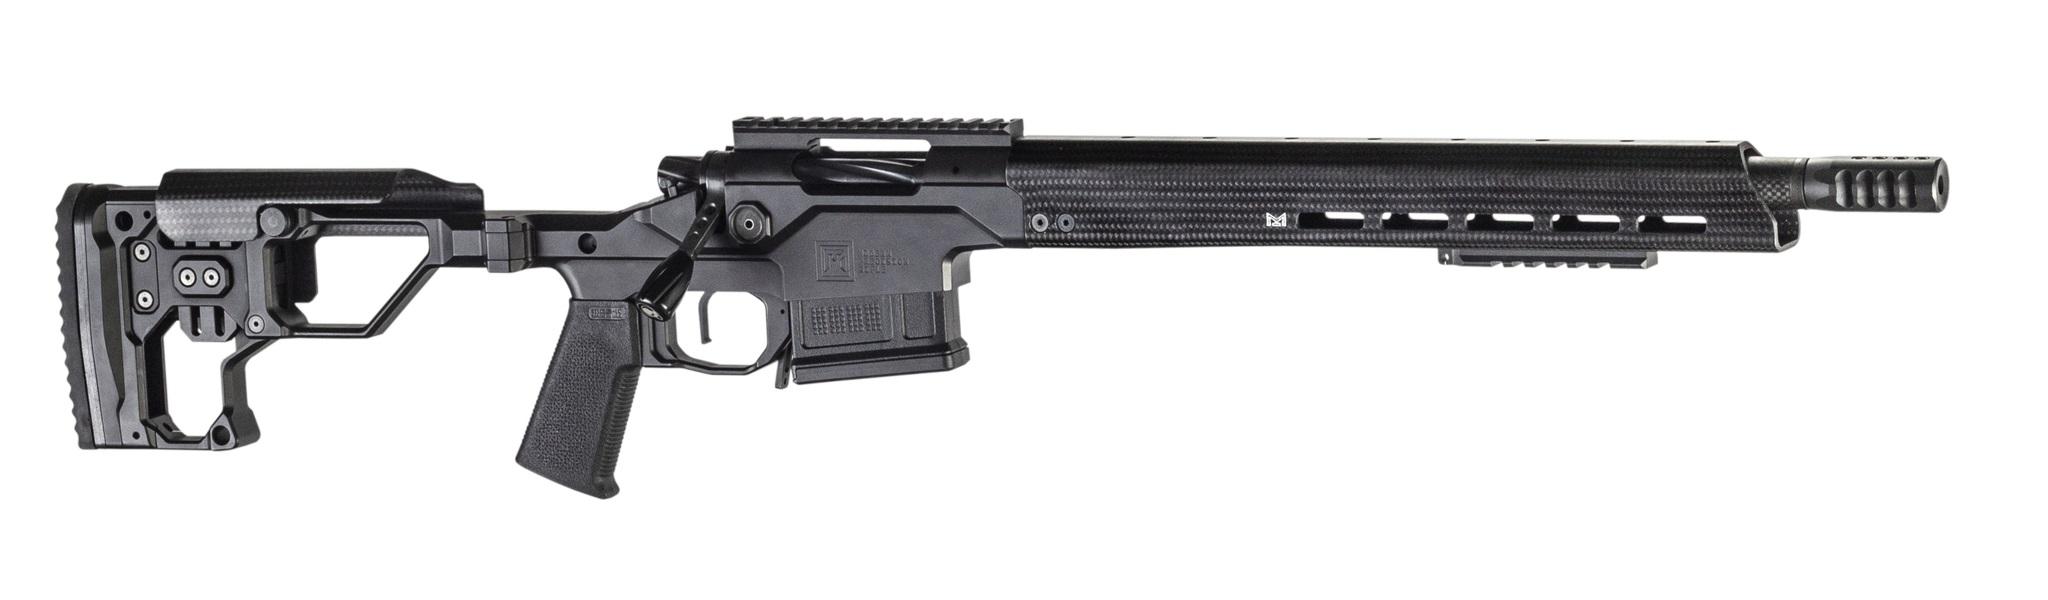 Christensen Arms Modern Precision Rifle 308 Win